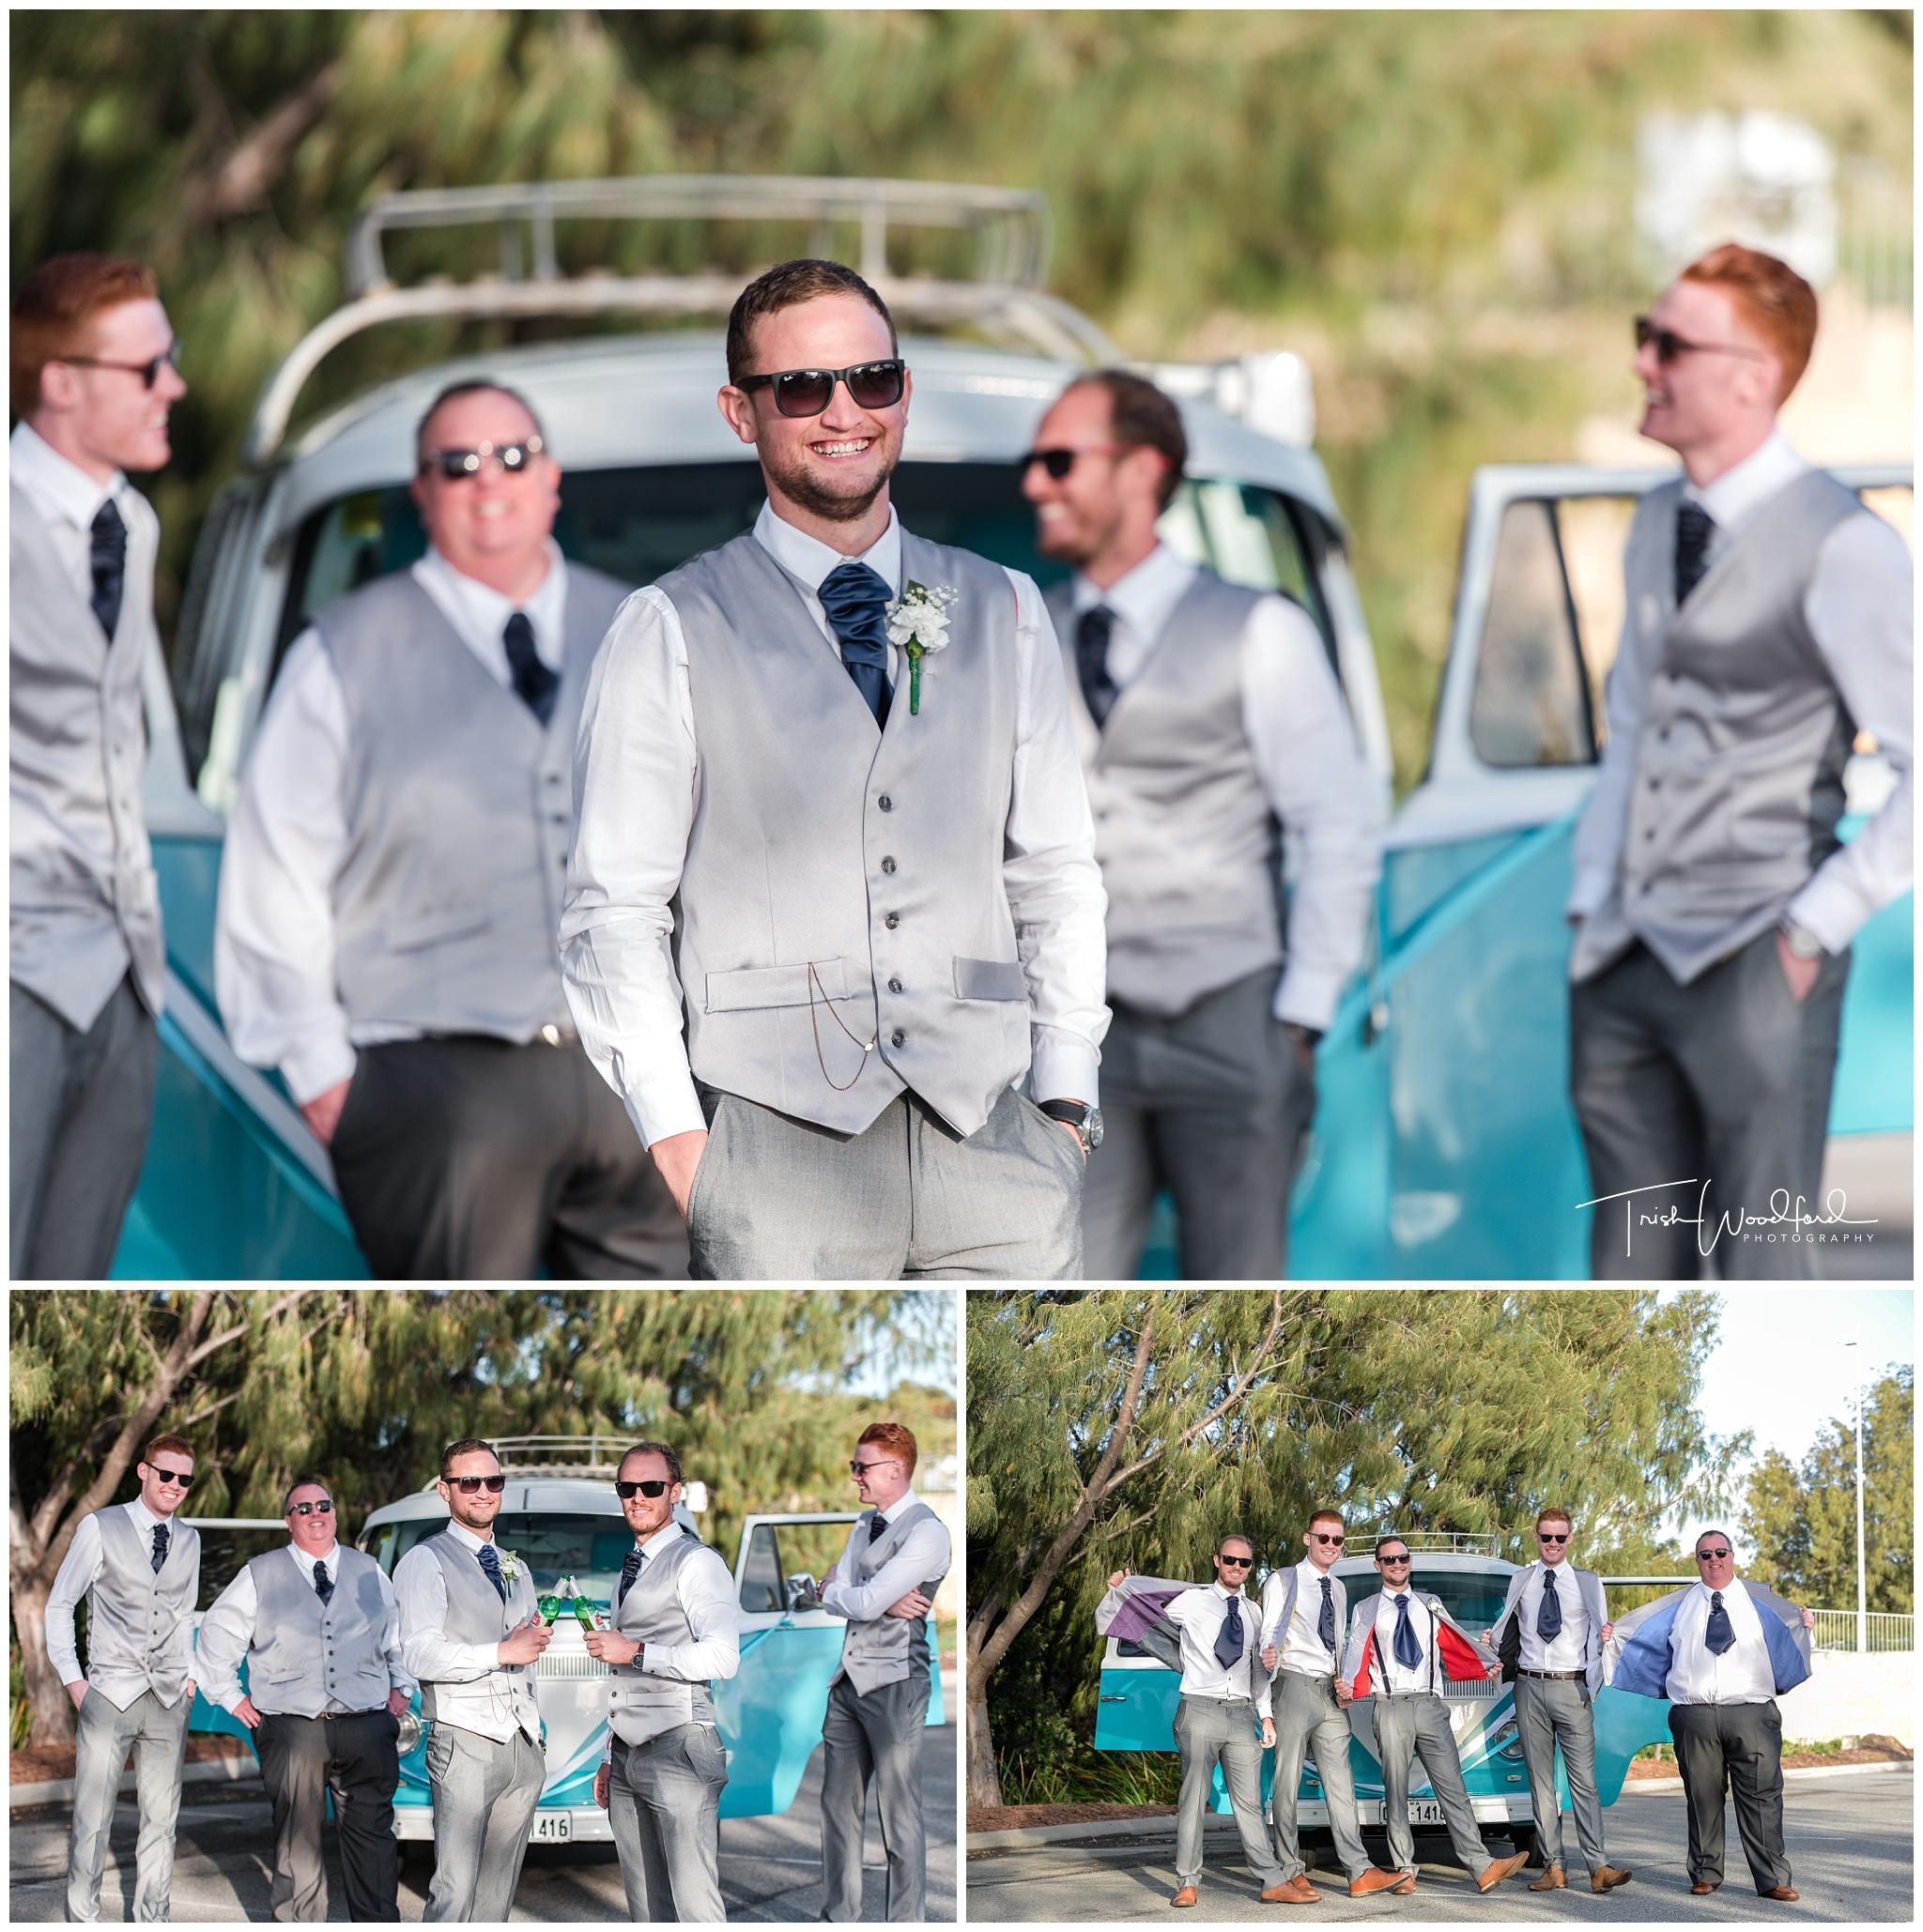 Perth Wedding Photography Groom & Groomsmen Combi